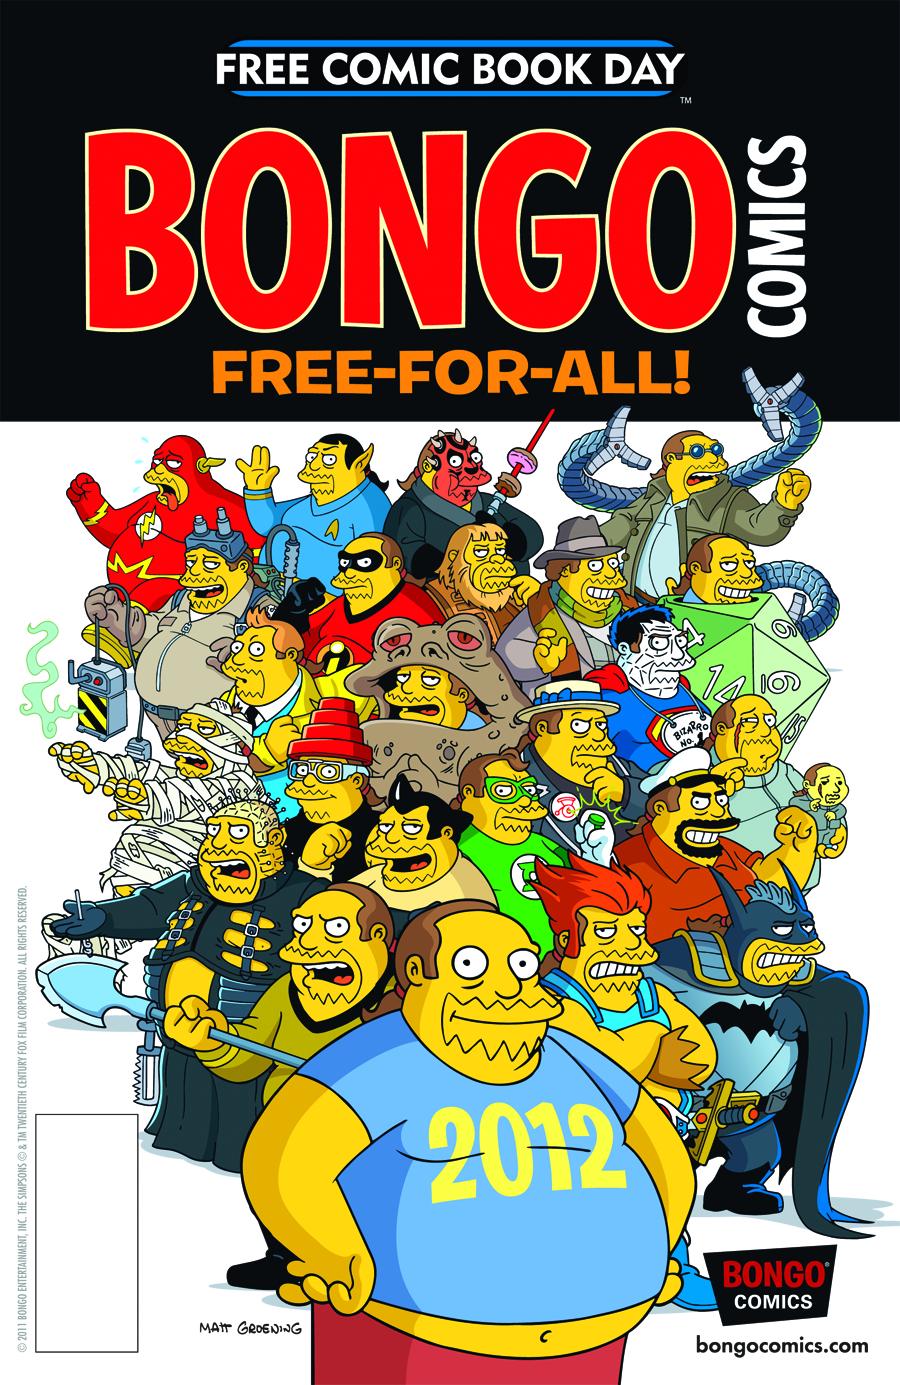 STK460618 Free Comic Book Day 2012: Reviews!